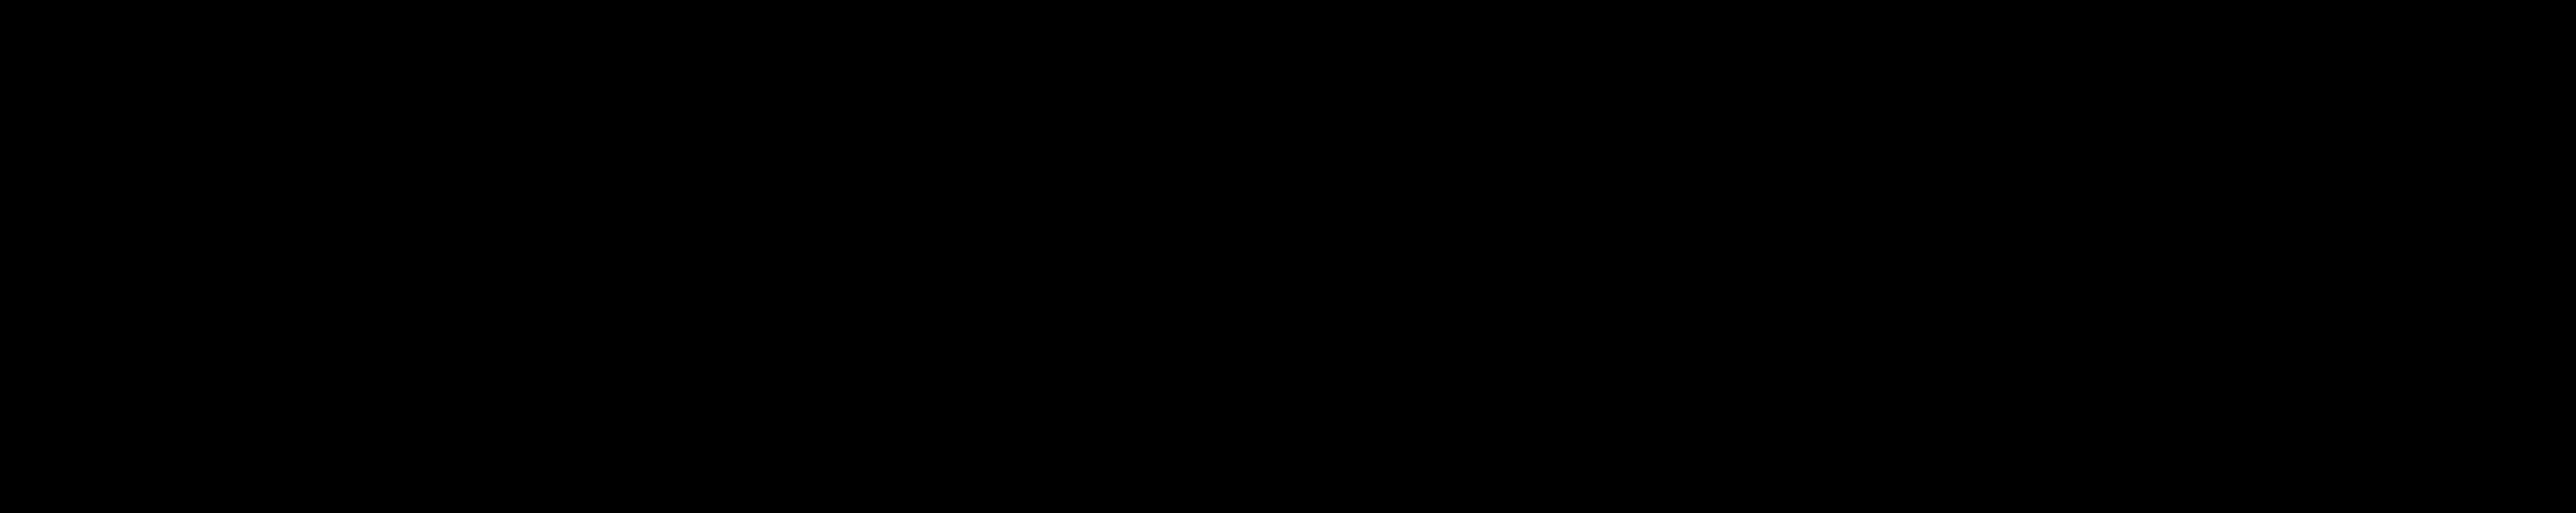 galaxy technology vector logos svg 20kb